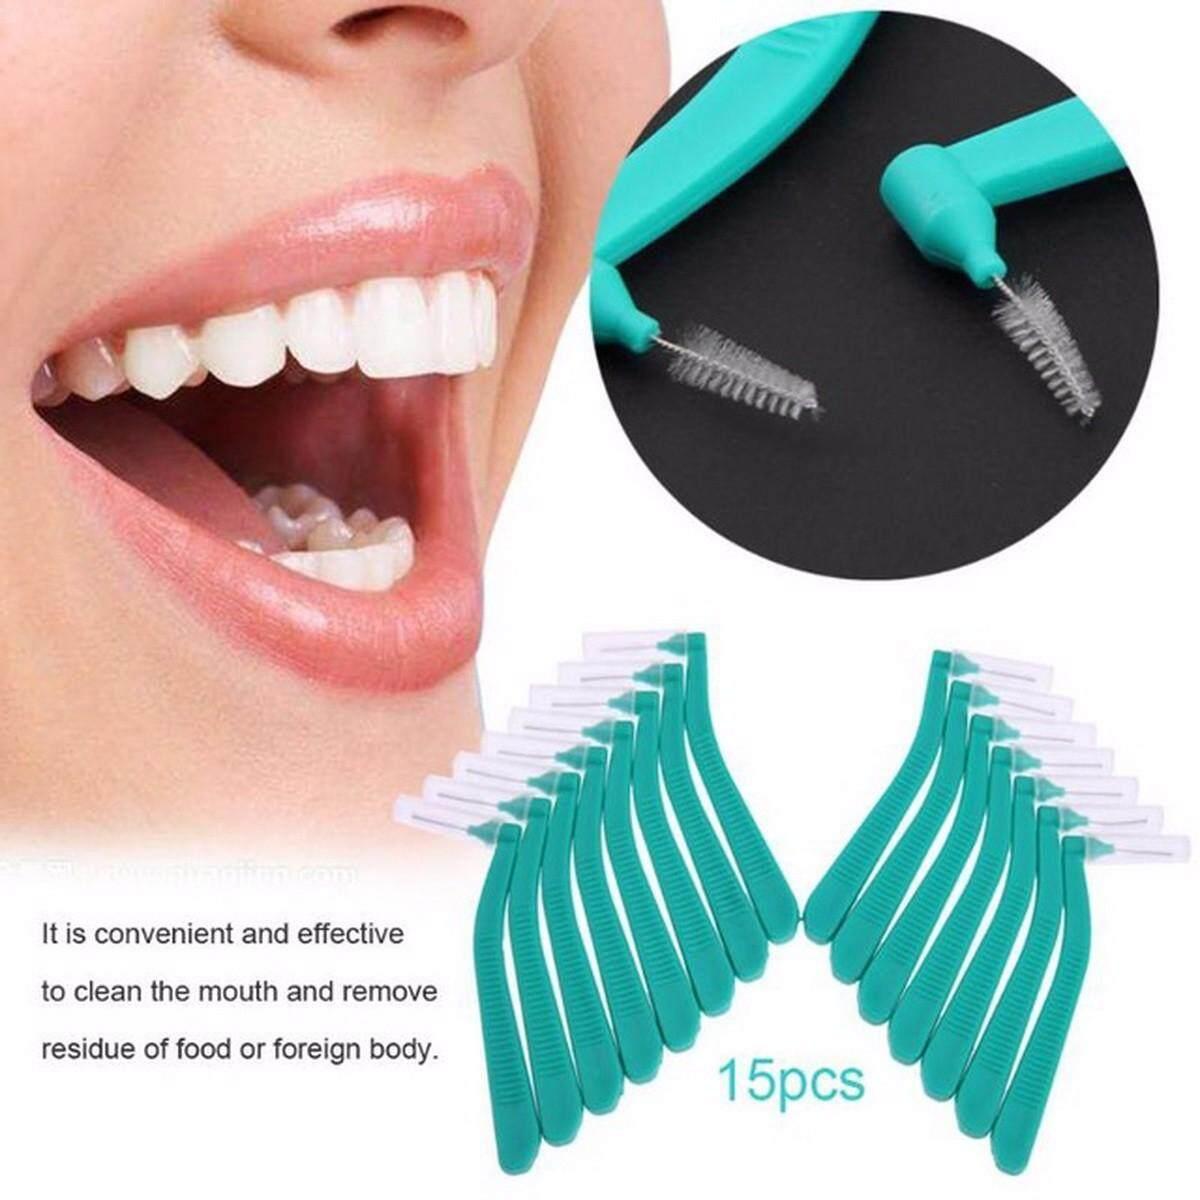 L Berbentuk Sikat Interdental Denta Benang Pembersih Interdental Ortodontik  Kawat Sikat Sikat Gigi Perawatan Lisan Tusuk a97da59d2e